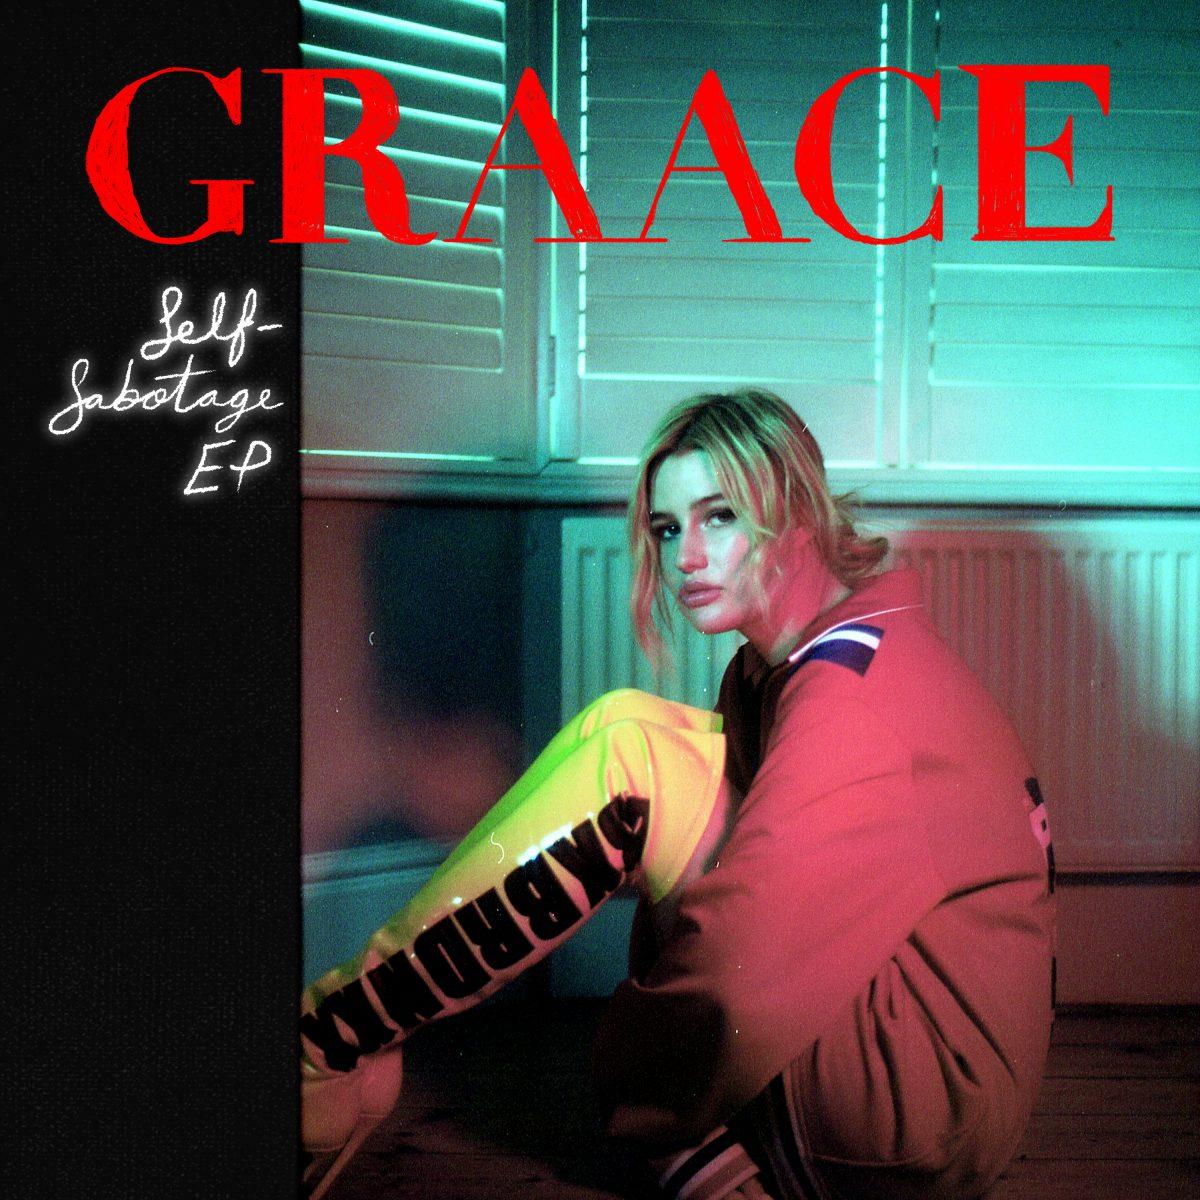 GRAACE - Self Sabotage EP